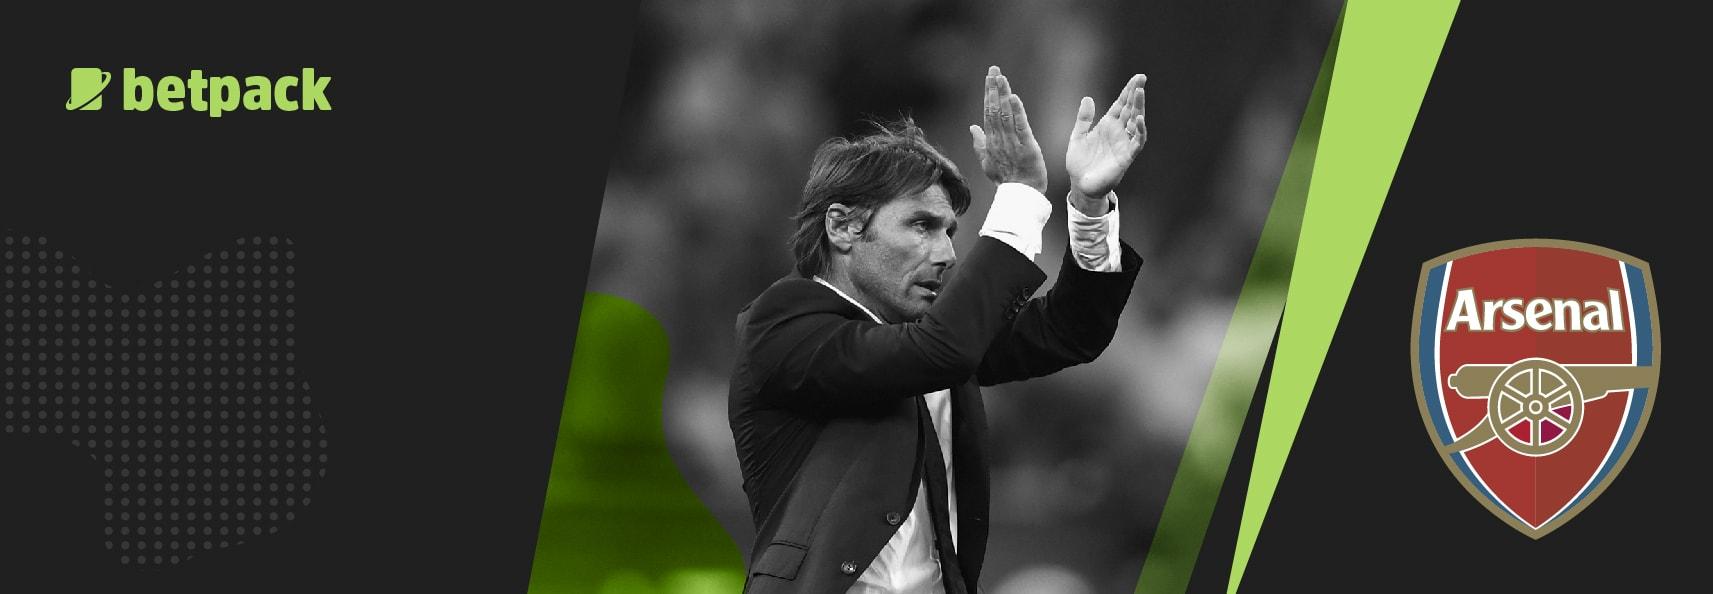 Latest update on Arsenal's interest in Antonio Conte